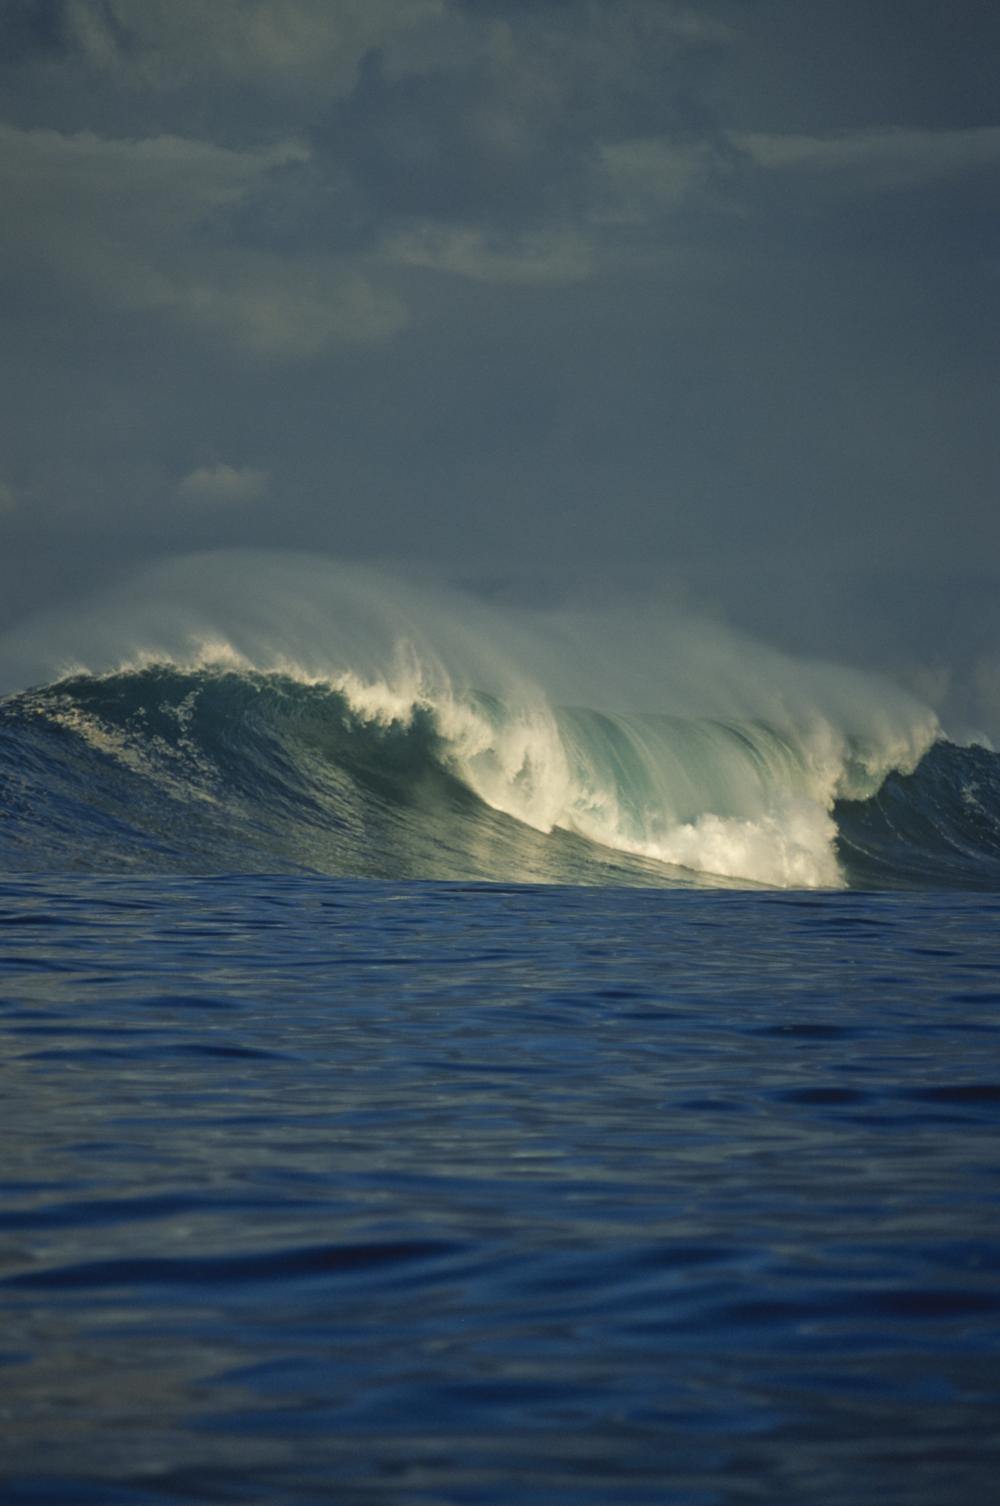 baja surf ocean magic productions.png